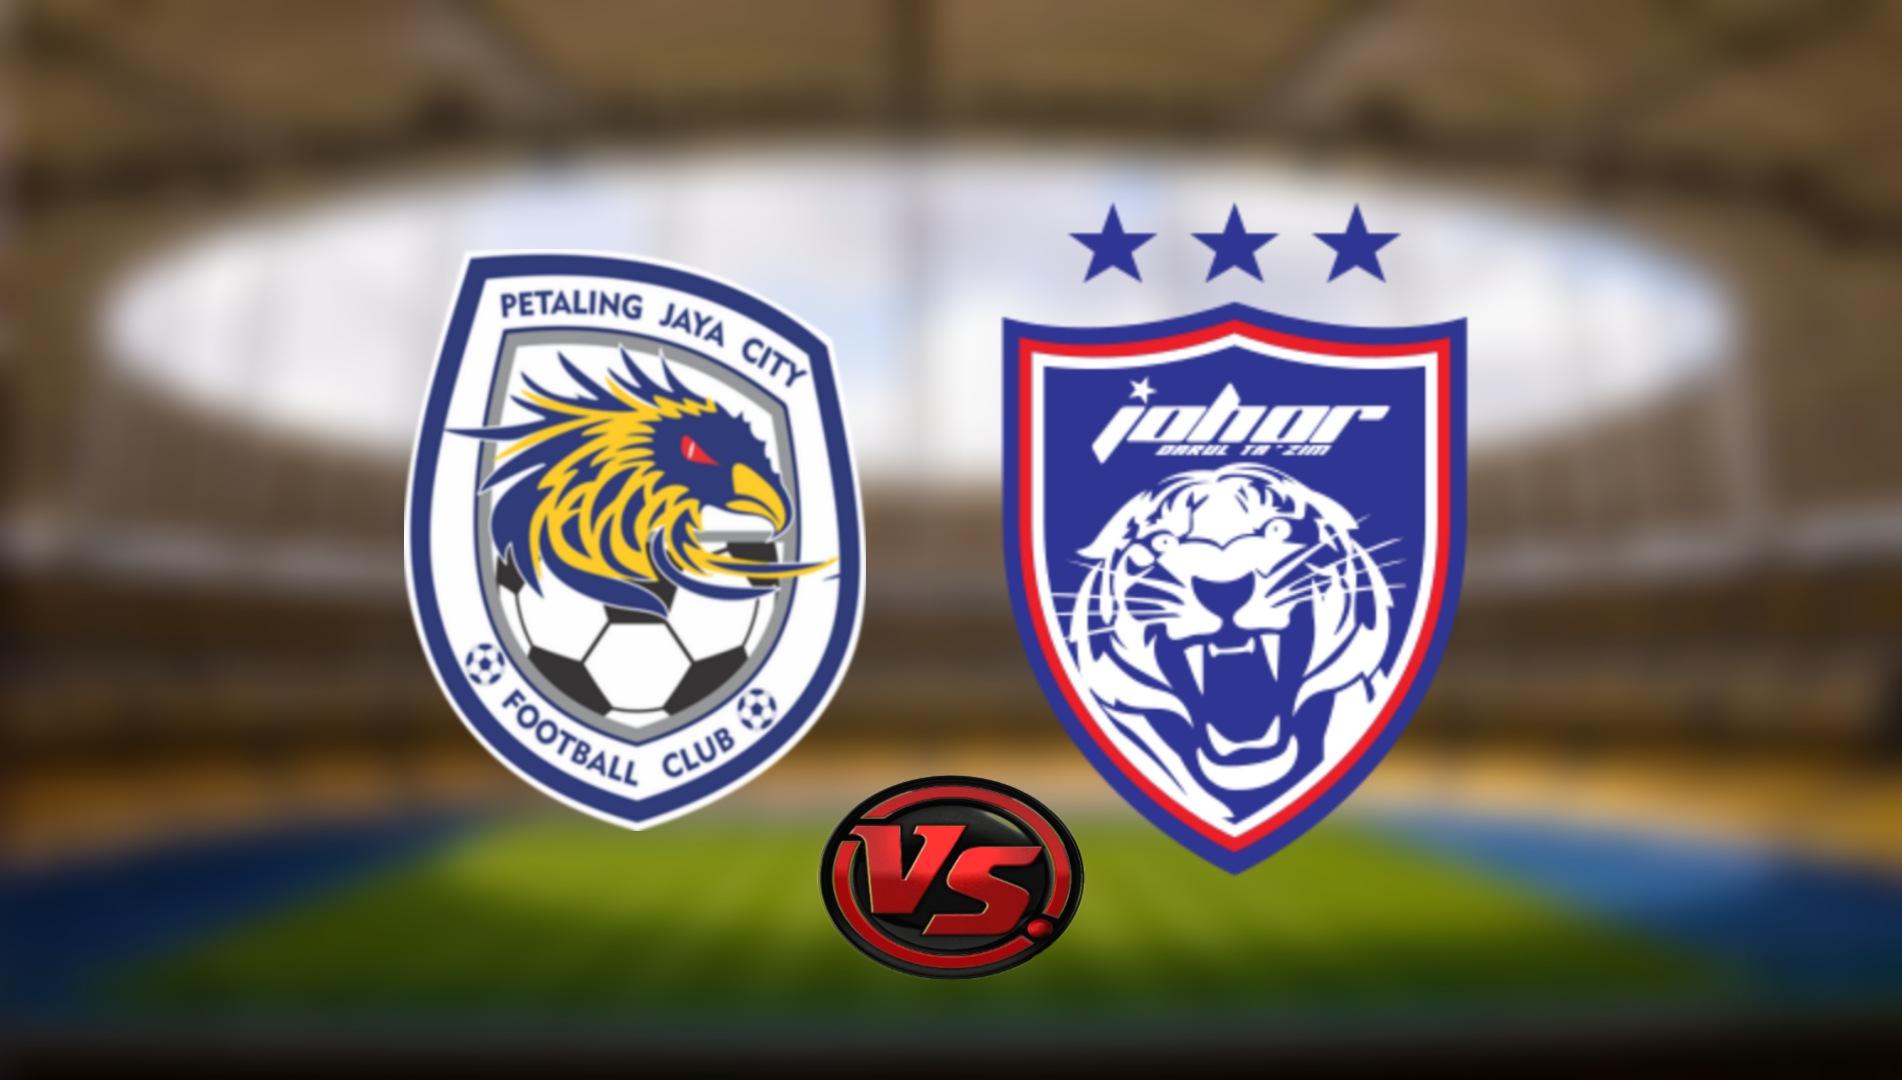 Live Streaming PJ City FC vs JDT FC Liga Super 21.8.2021